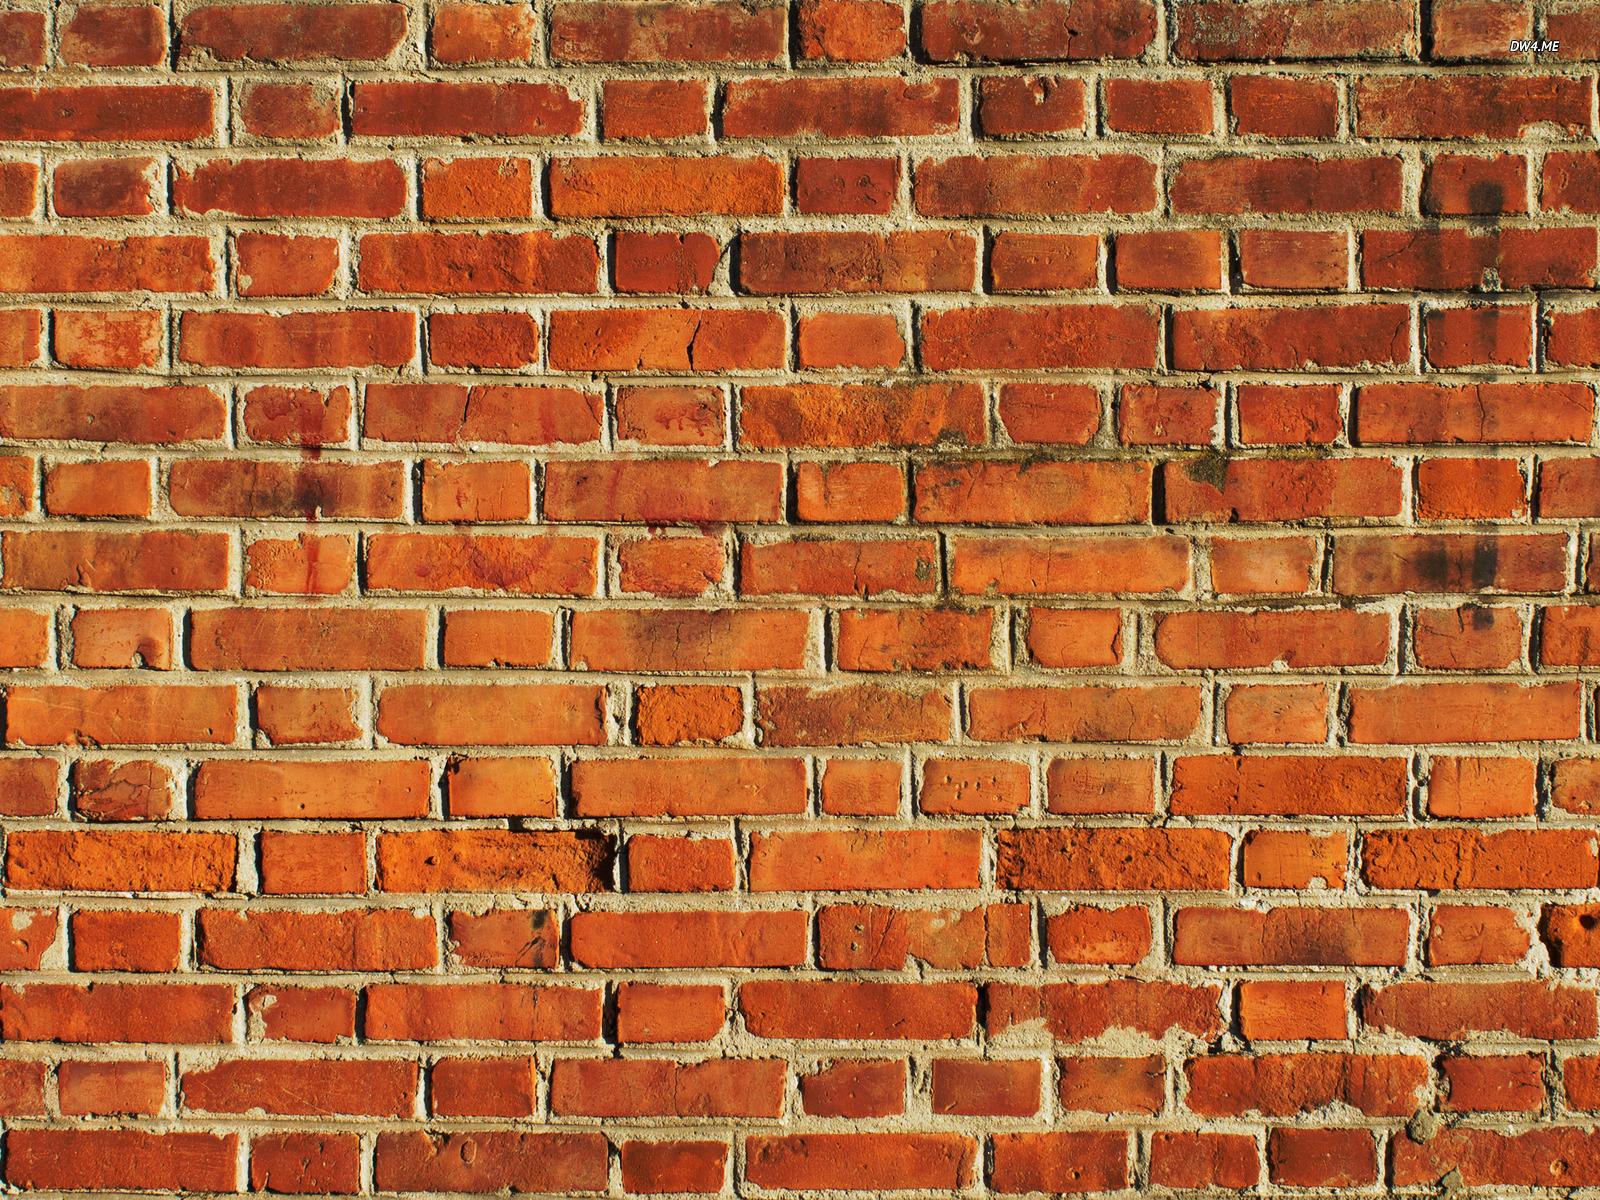 Brick wall wallpaper   Photography wallpapers   817 1600x1200